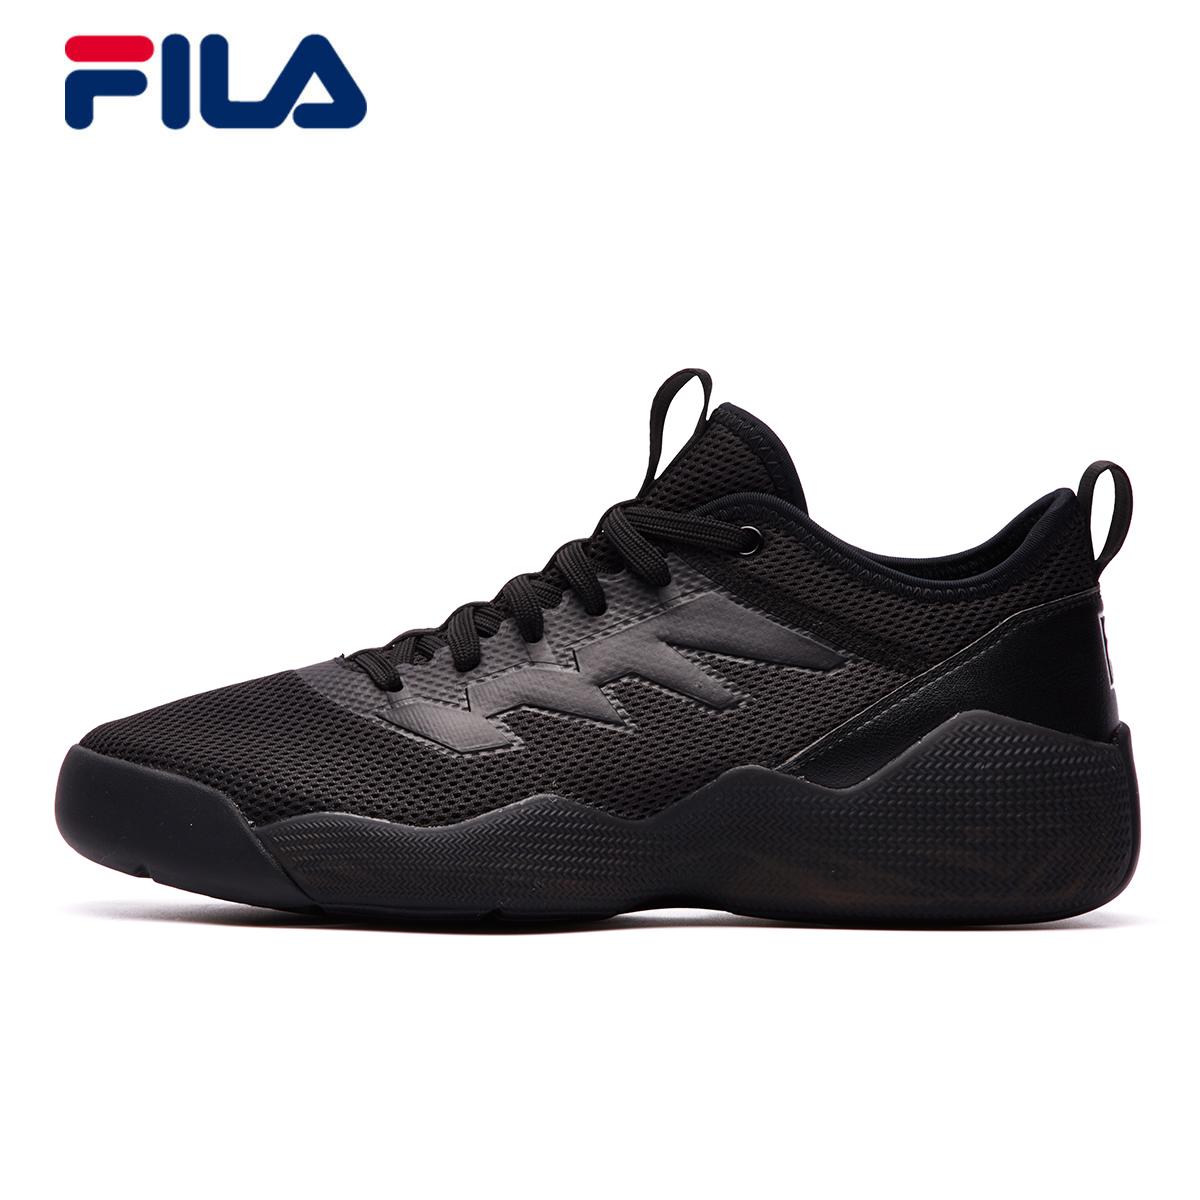 usd 23179 fila mens shoes 2018 spring new classic